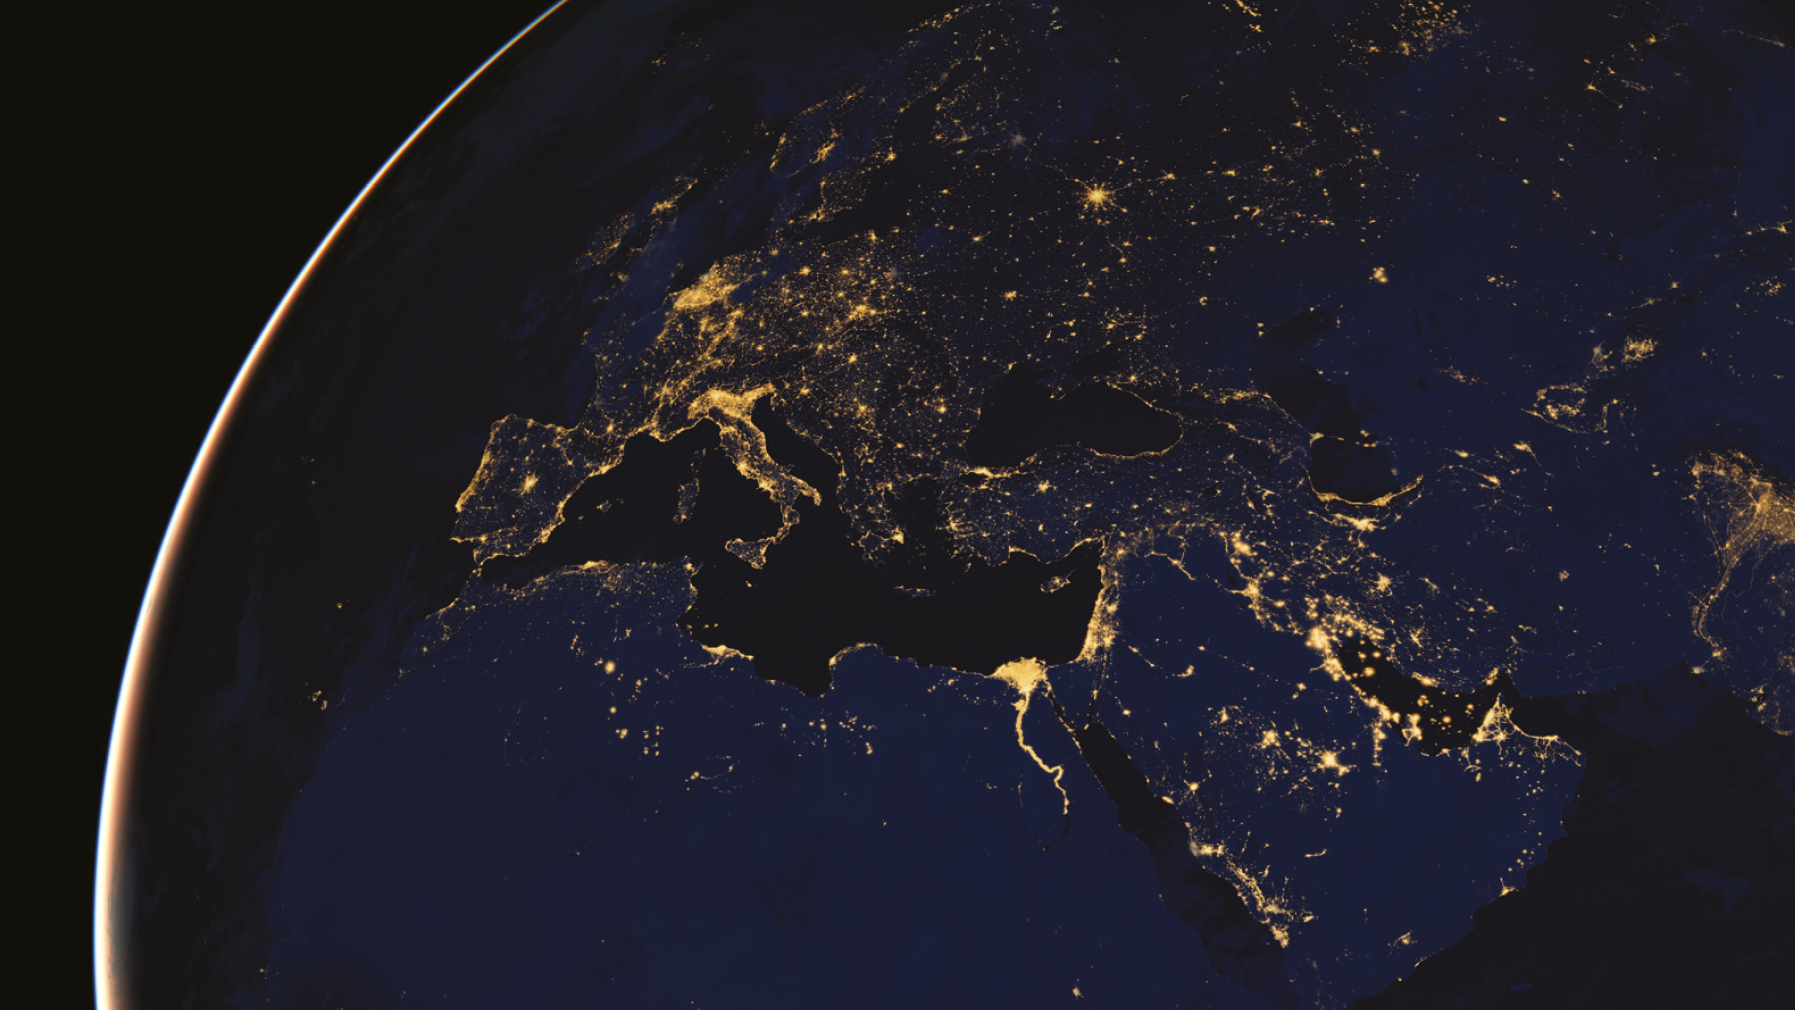 © NASA Earth Observatory